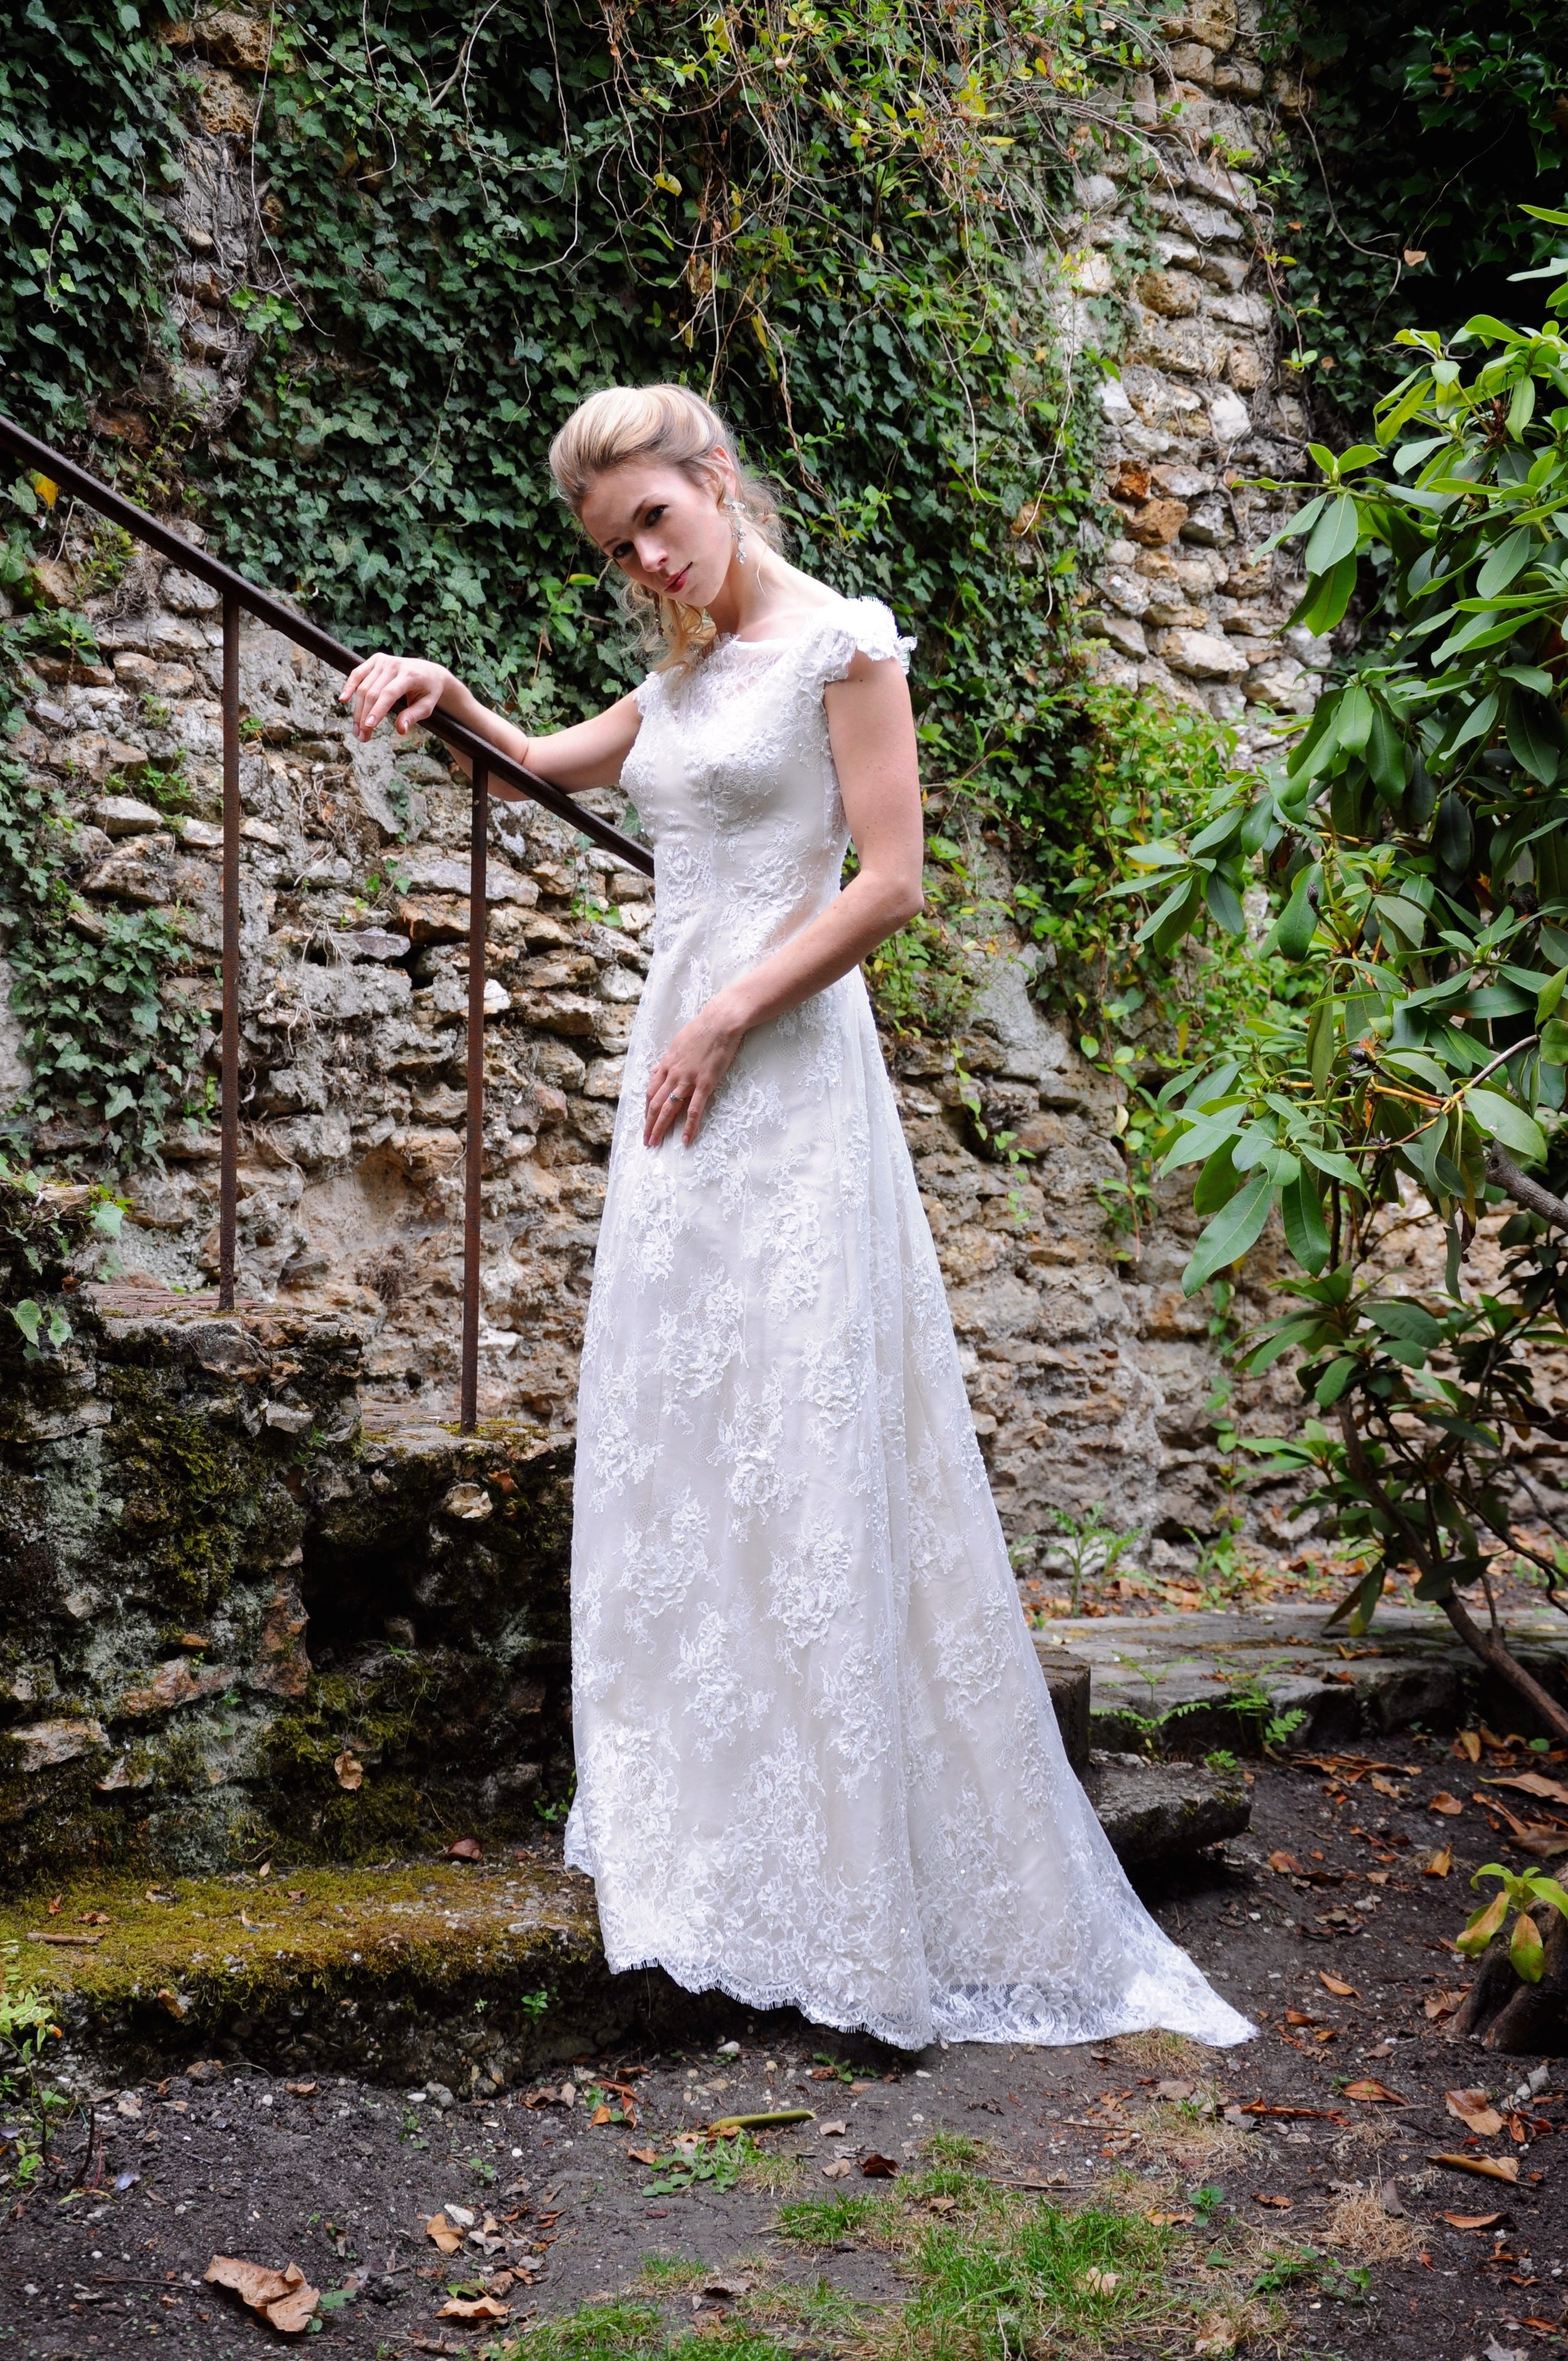 Robe de mariée romantique Agnès Szabelewski.jpg